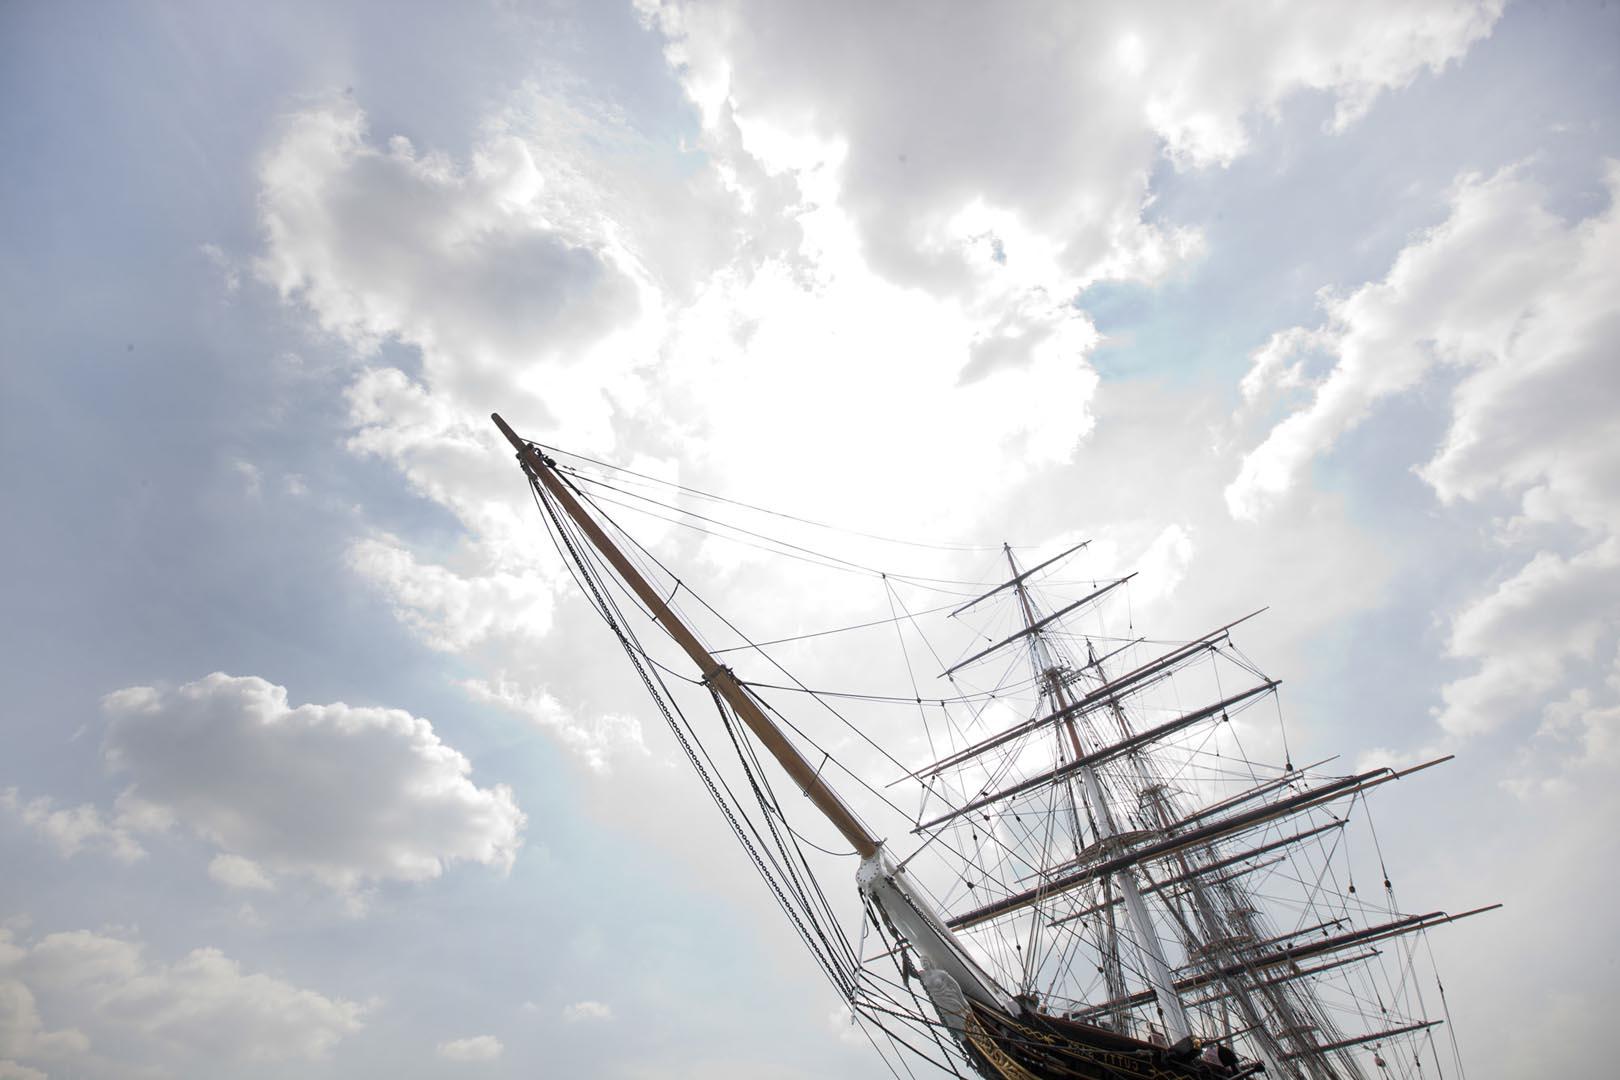 Digital Marketing & the HMS Victory